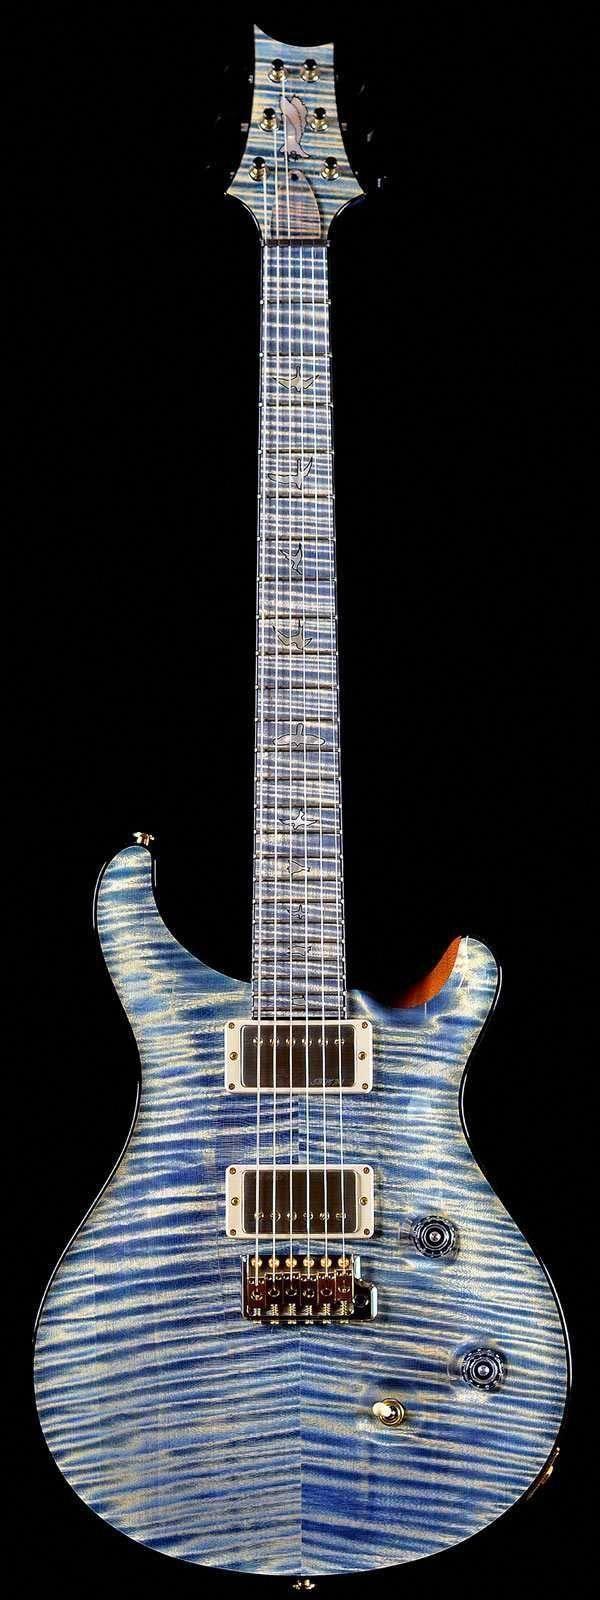 PRS Guitar Custom 24 Zebra PRS Guitar S2 #guitarmusic #guitarpedal #PRSGuitars #prsguitar PRS Guitar Custom 24 Zebra PRS Guitar S2 #guitarmusic #guitarpedal #PRSGuitars #prsguitar PRS Guitar Custom 24 Zebra PRS Guitar S2 #guitarmusic #guitarpedal #PRSGuitars #prsguitar PRS Guitar Custom 24 Zebra PRS Guitar S2 #guitarmusic #guitarpedal #PRSGuitars #prsguitar